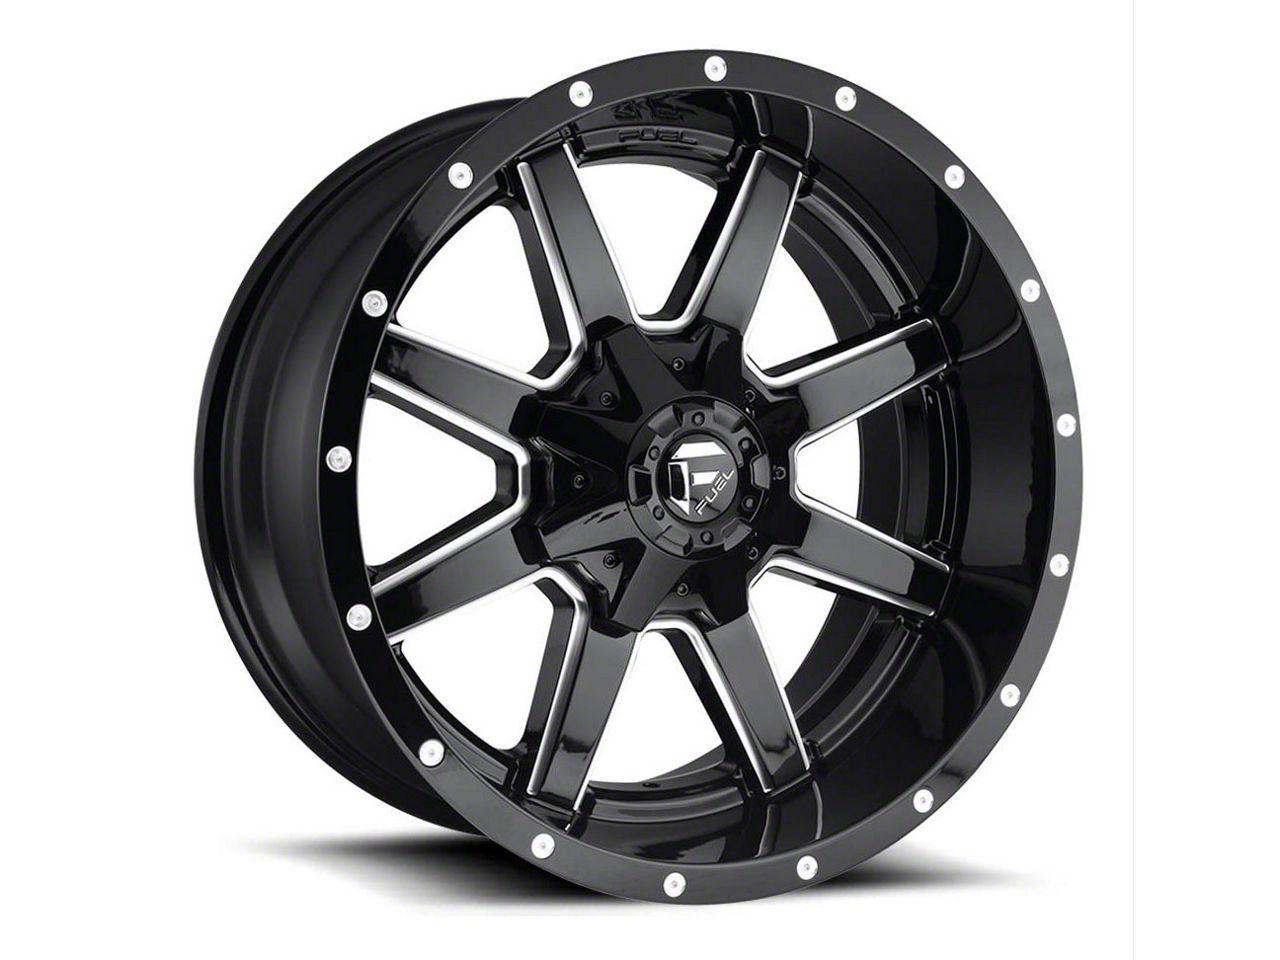 Fuel Wheels Maverick Gloss Black Milled 6-Lug Wheel - 22x12 (99-18 Silverado 1500)